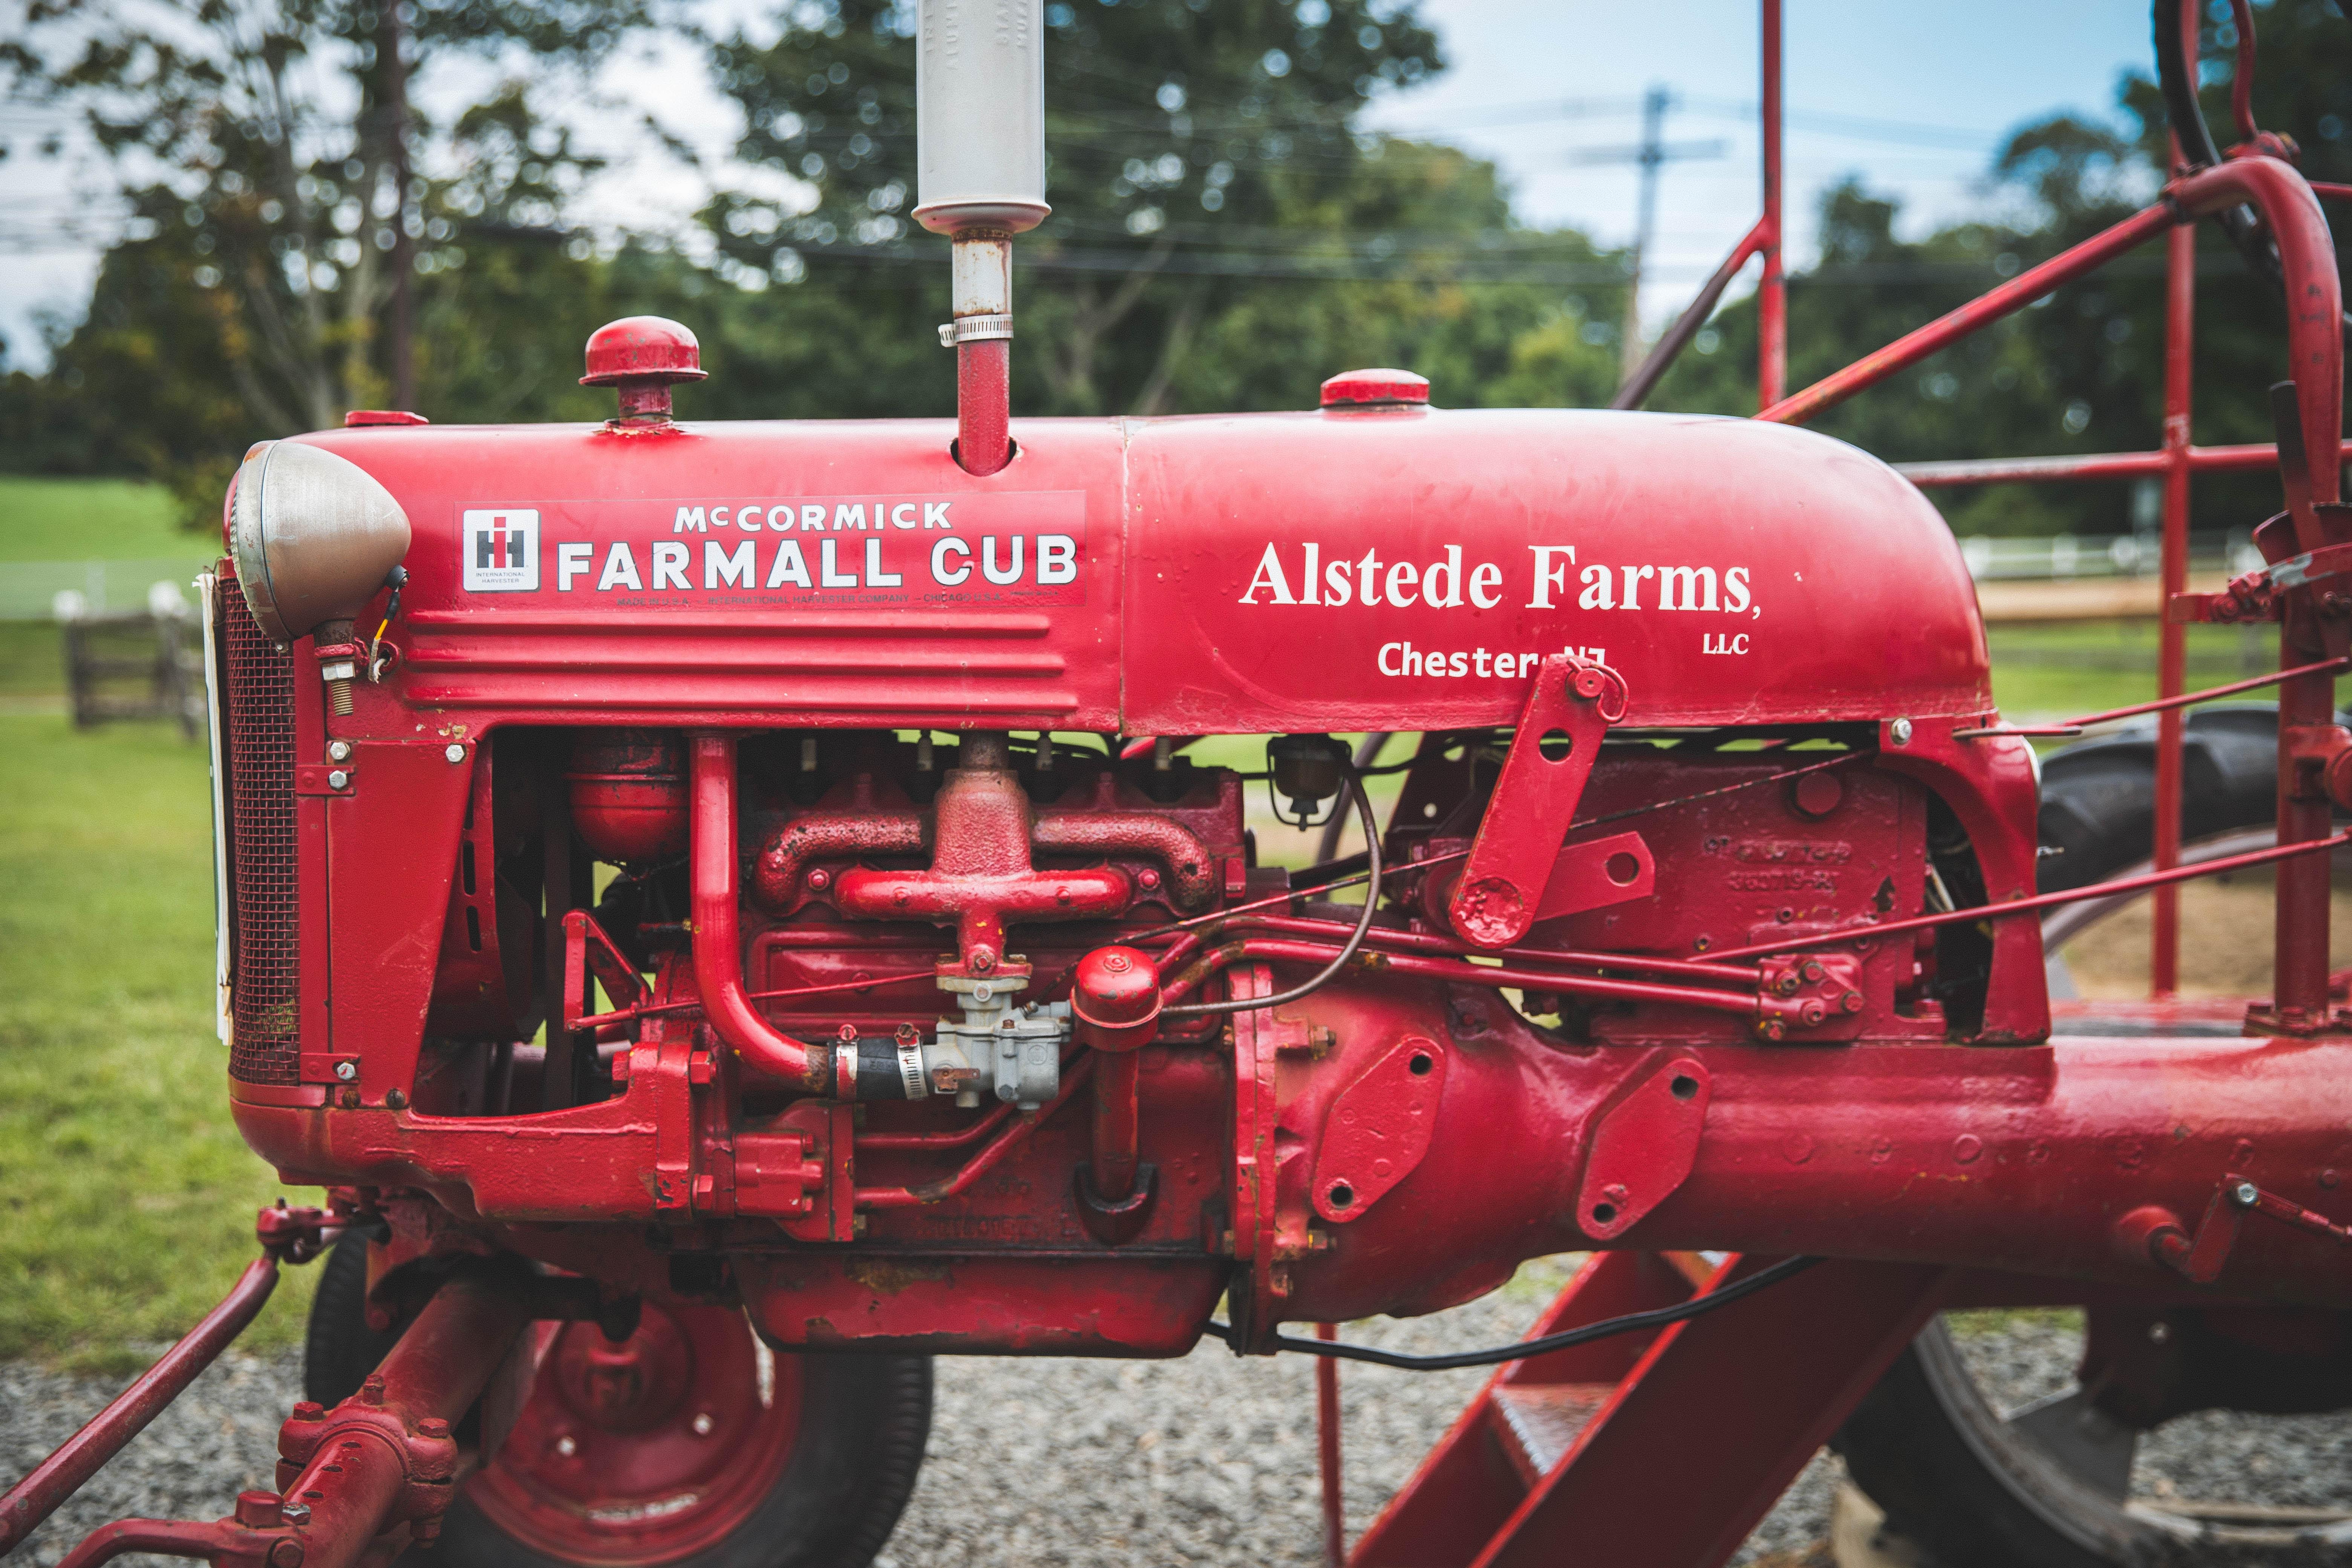 red Farmall Cub tractor